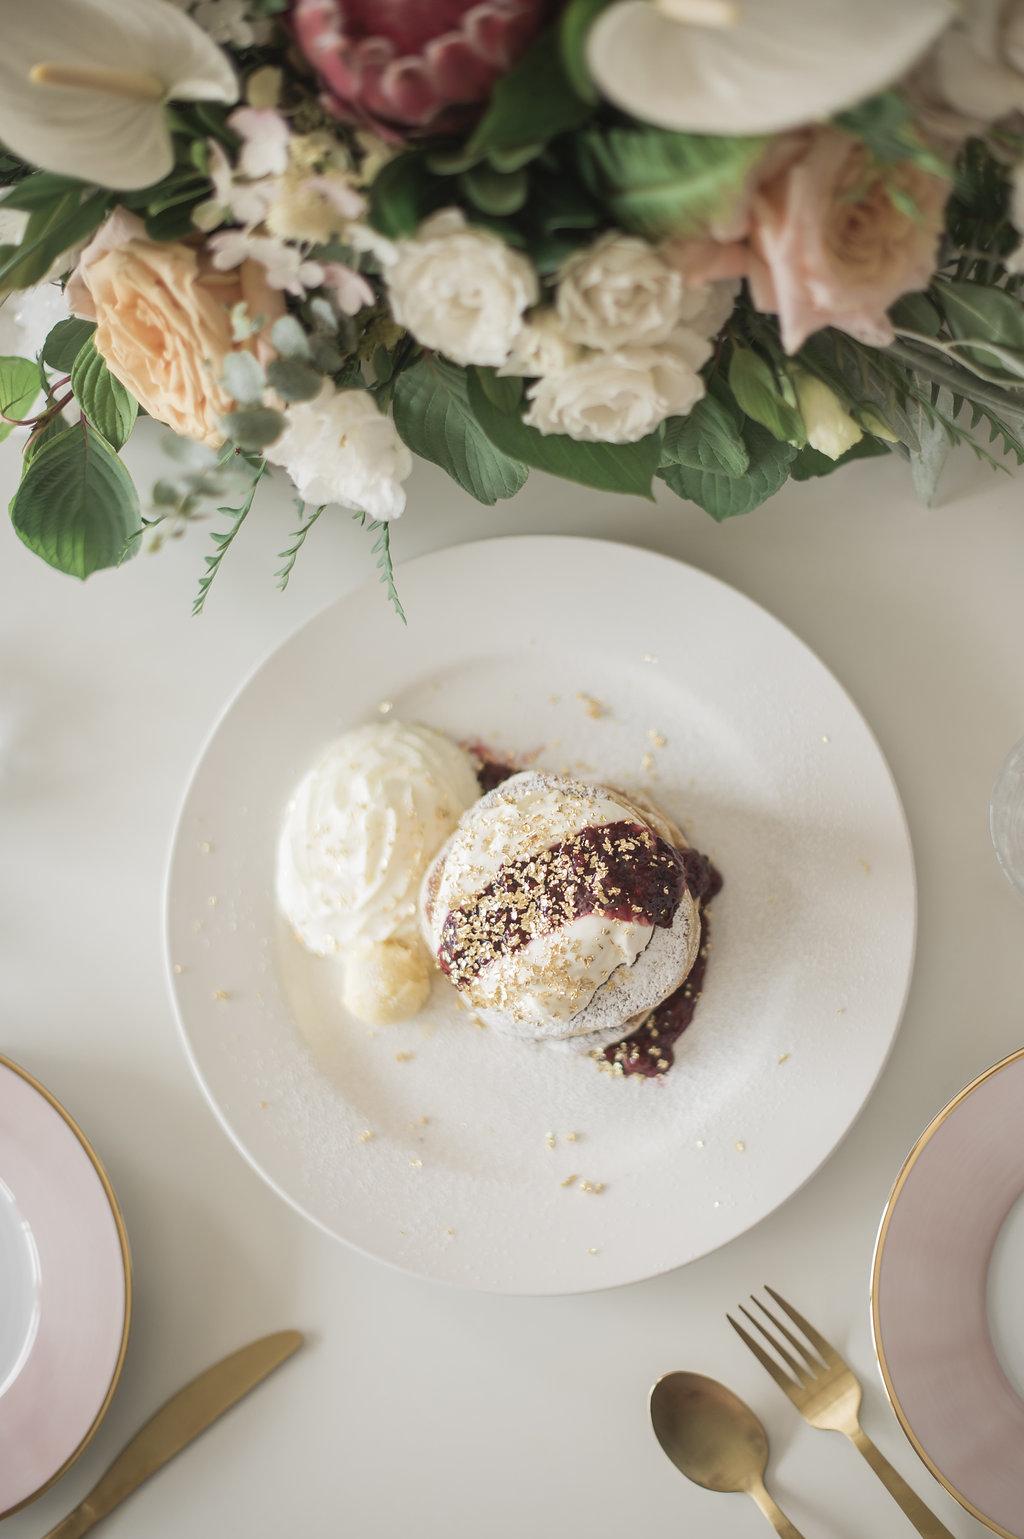 Motel-Restaurant-Editorial-Vineyard-Bride-photo-by-Blynda-DaCosta-Photography-019.JPG